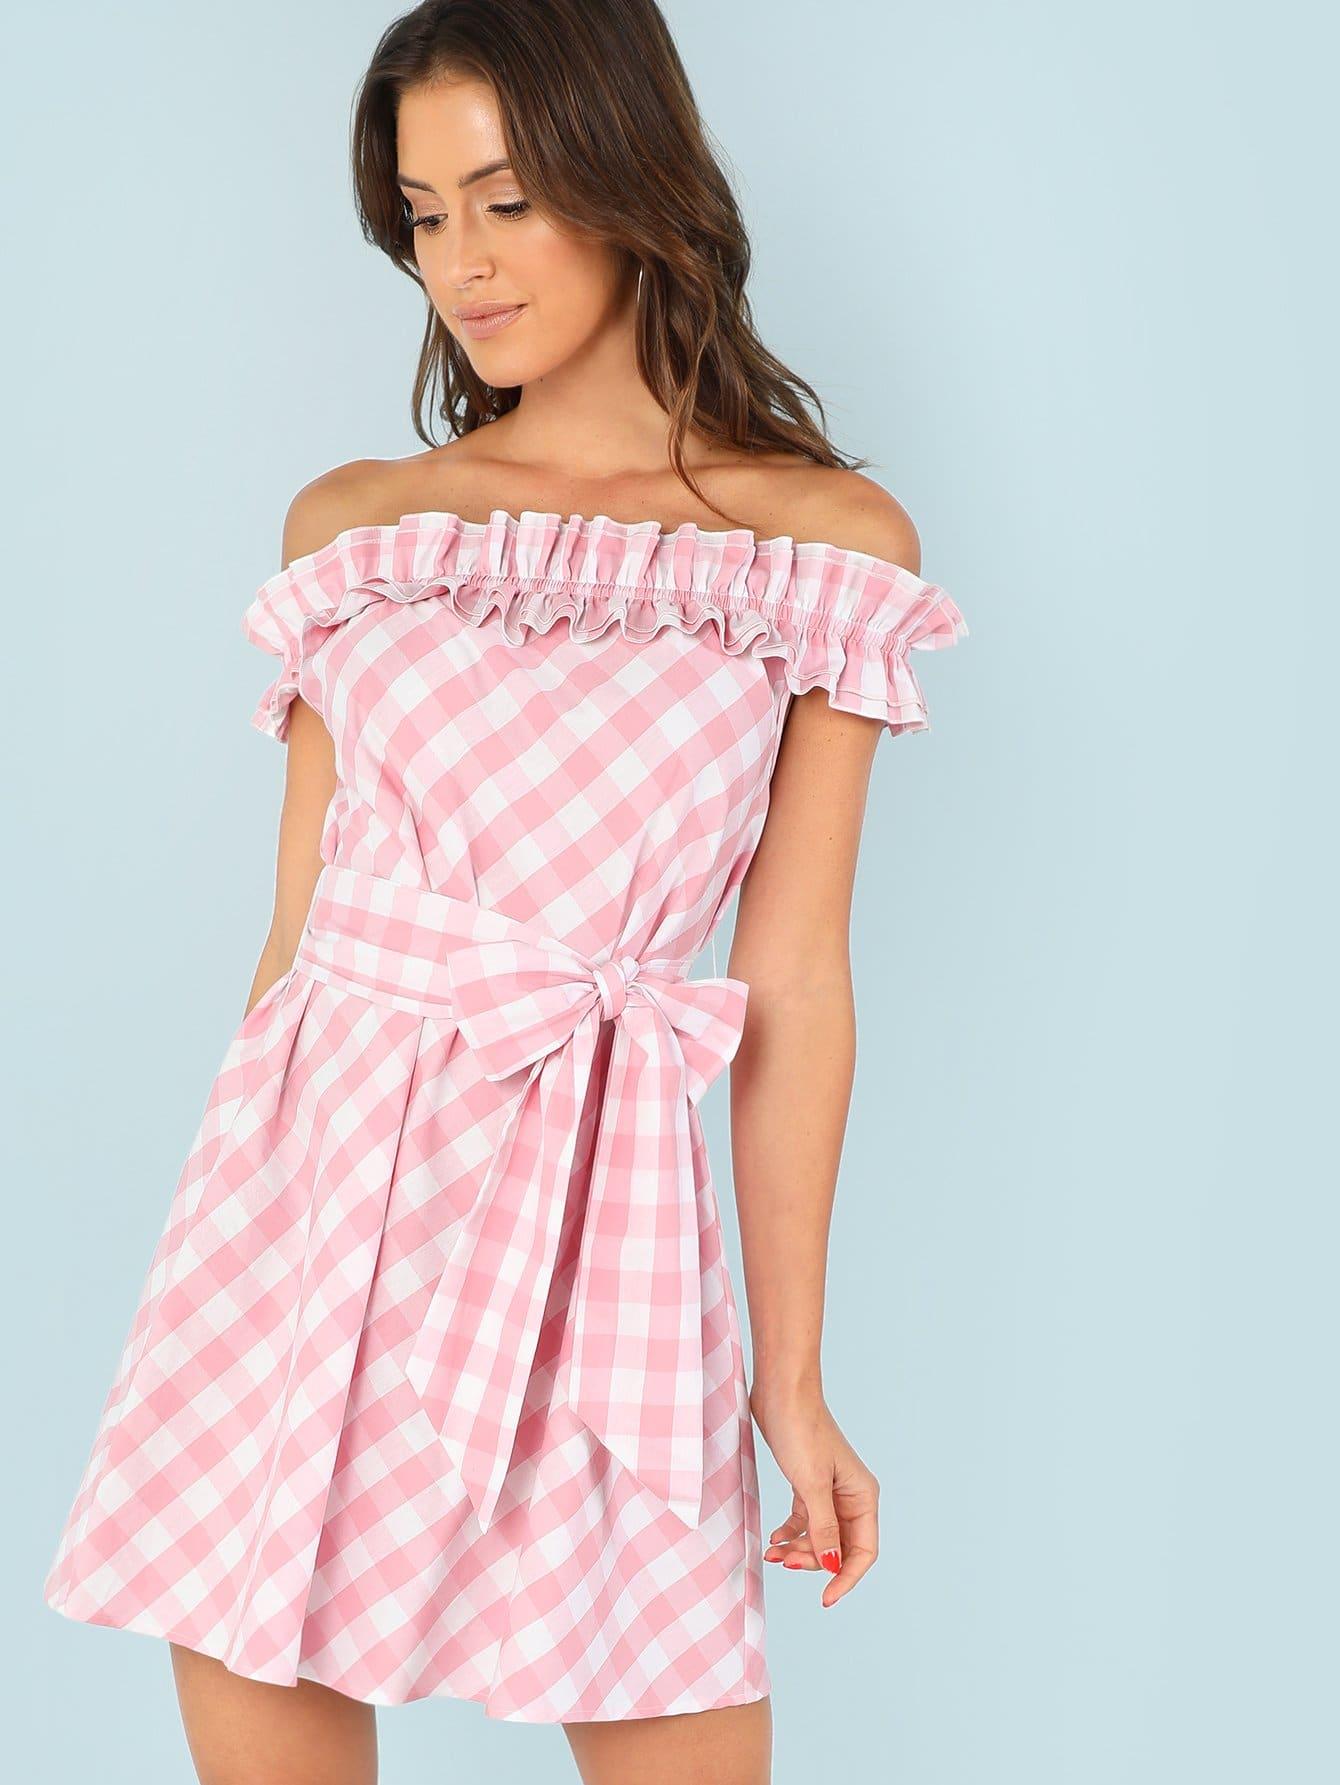 Layered Ruffle Trim Self Belted Plaid Dress self belted solid ruffle trim dress